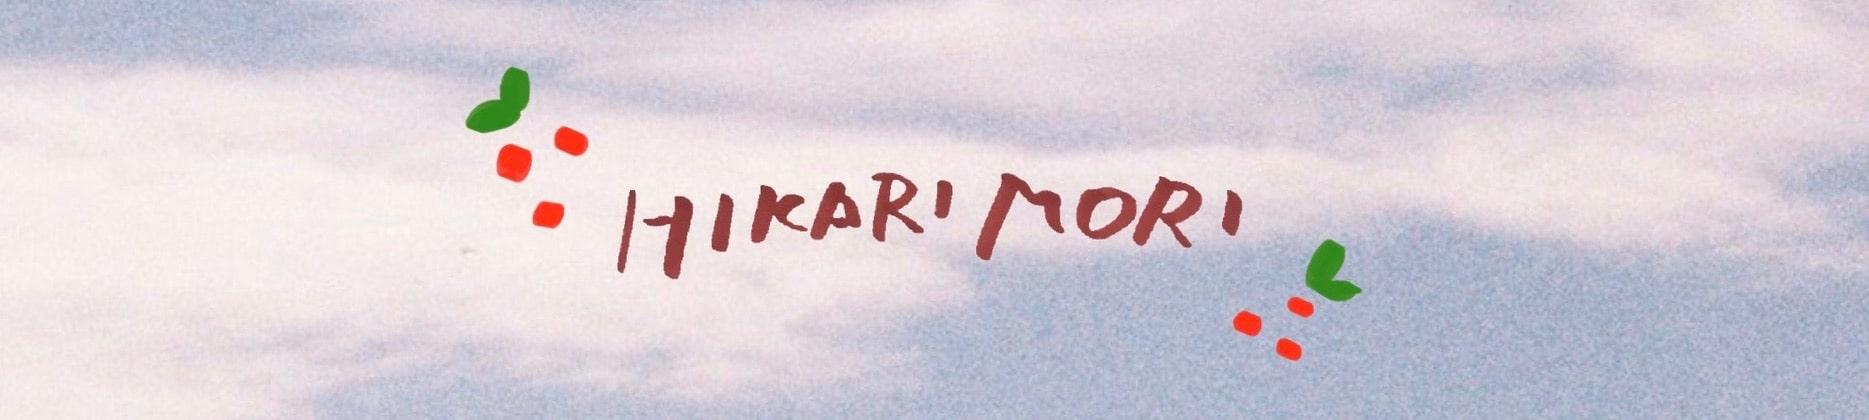 Hikari Mori YouTube header